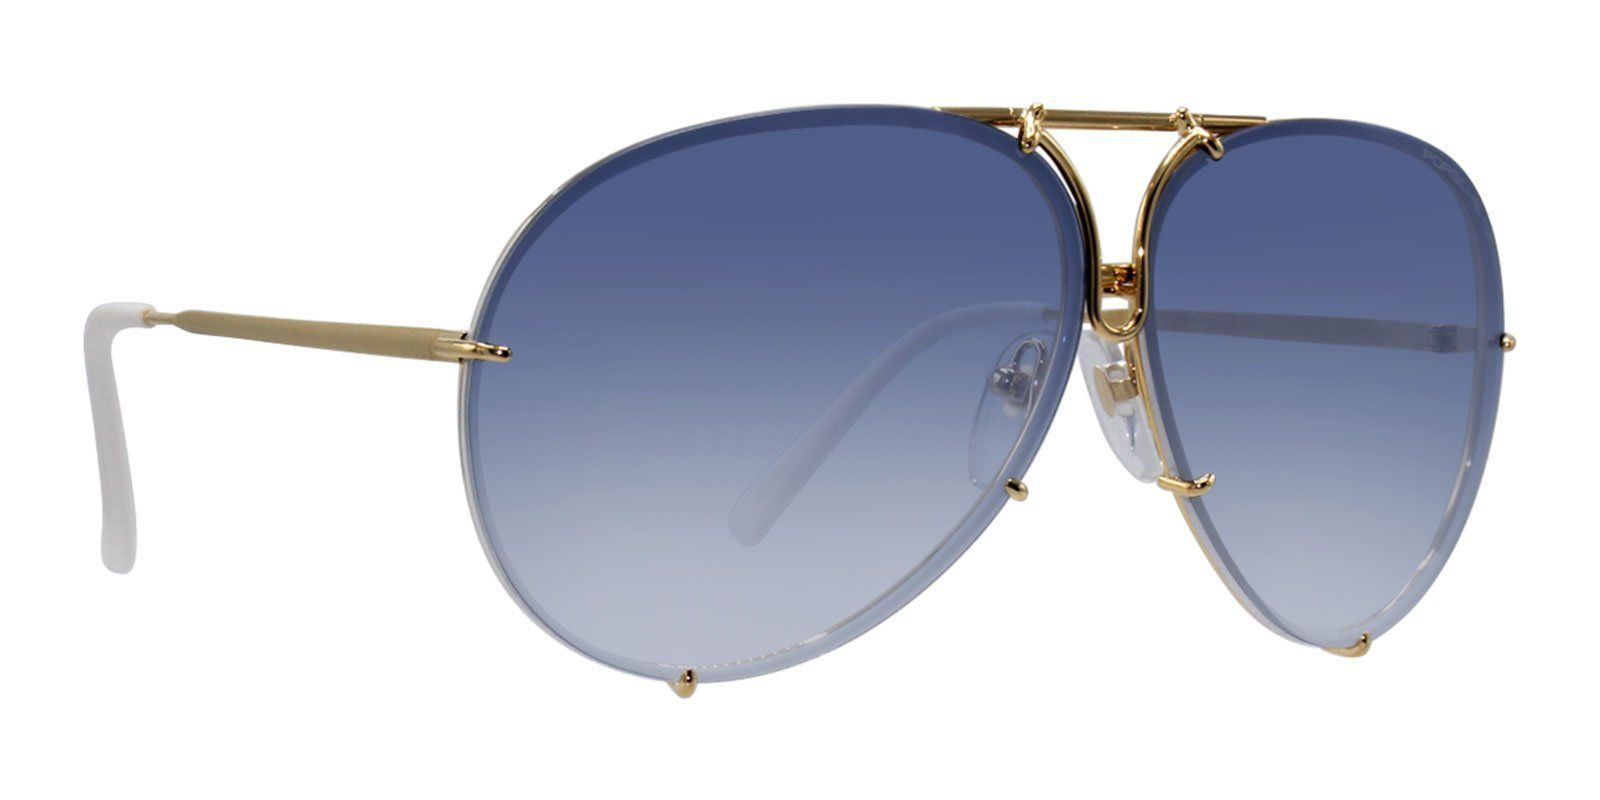 39066b5f5b Porsche Design - P8478 Gold - Blue-sunglasses-Designer Eyes ...